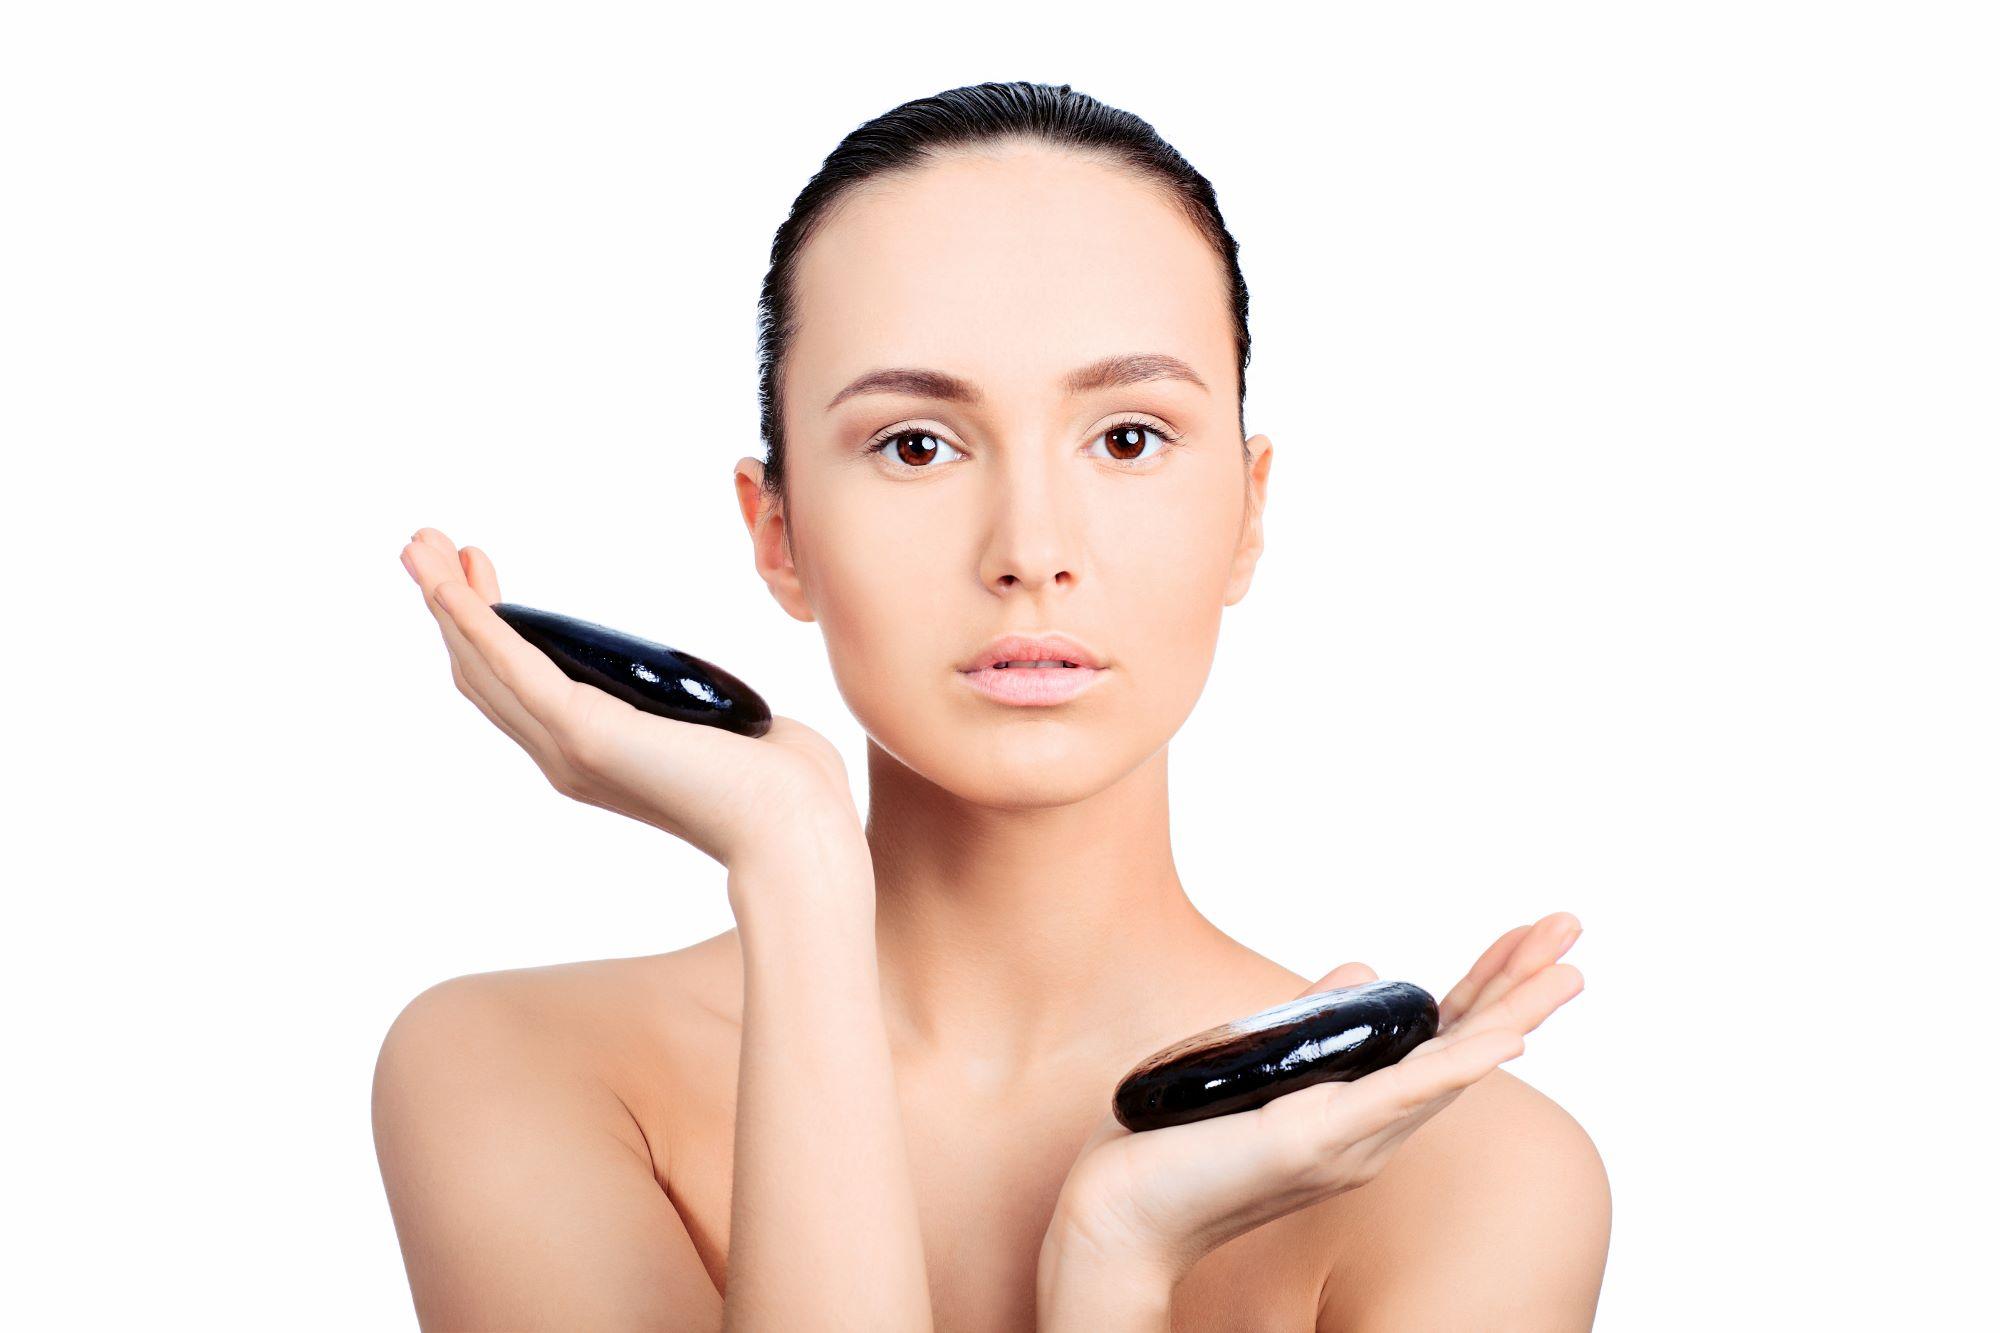 Produse Cosmetice Faciale, Coroporale - Home User